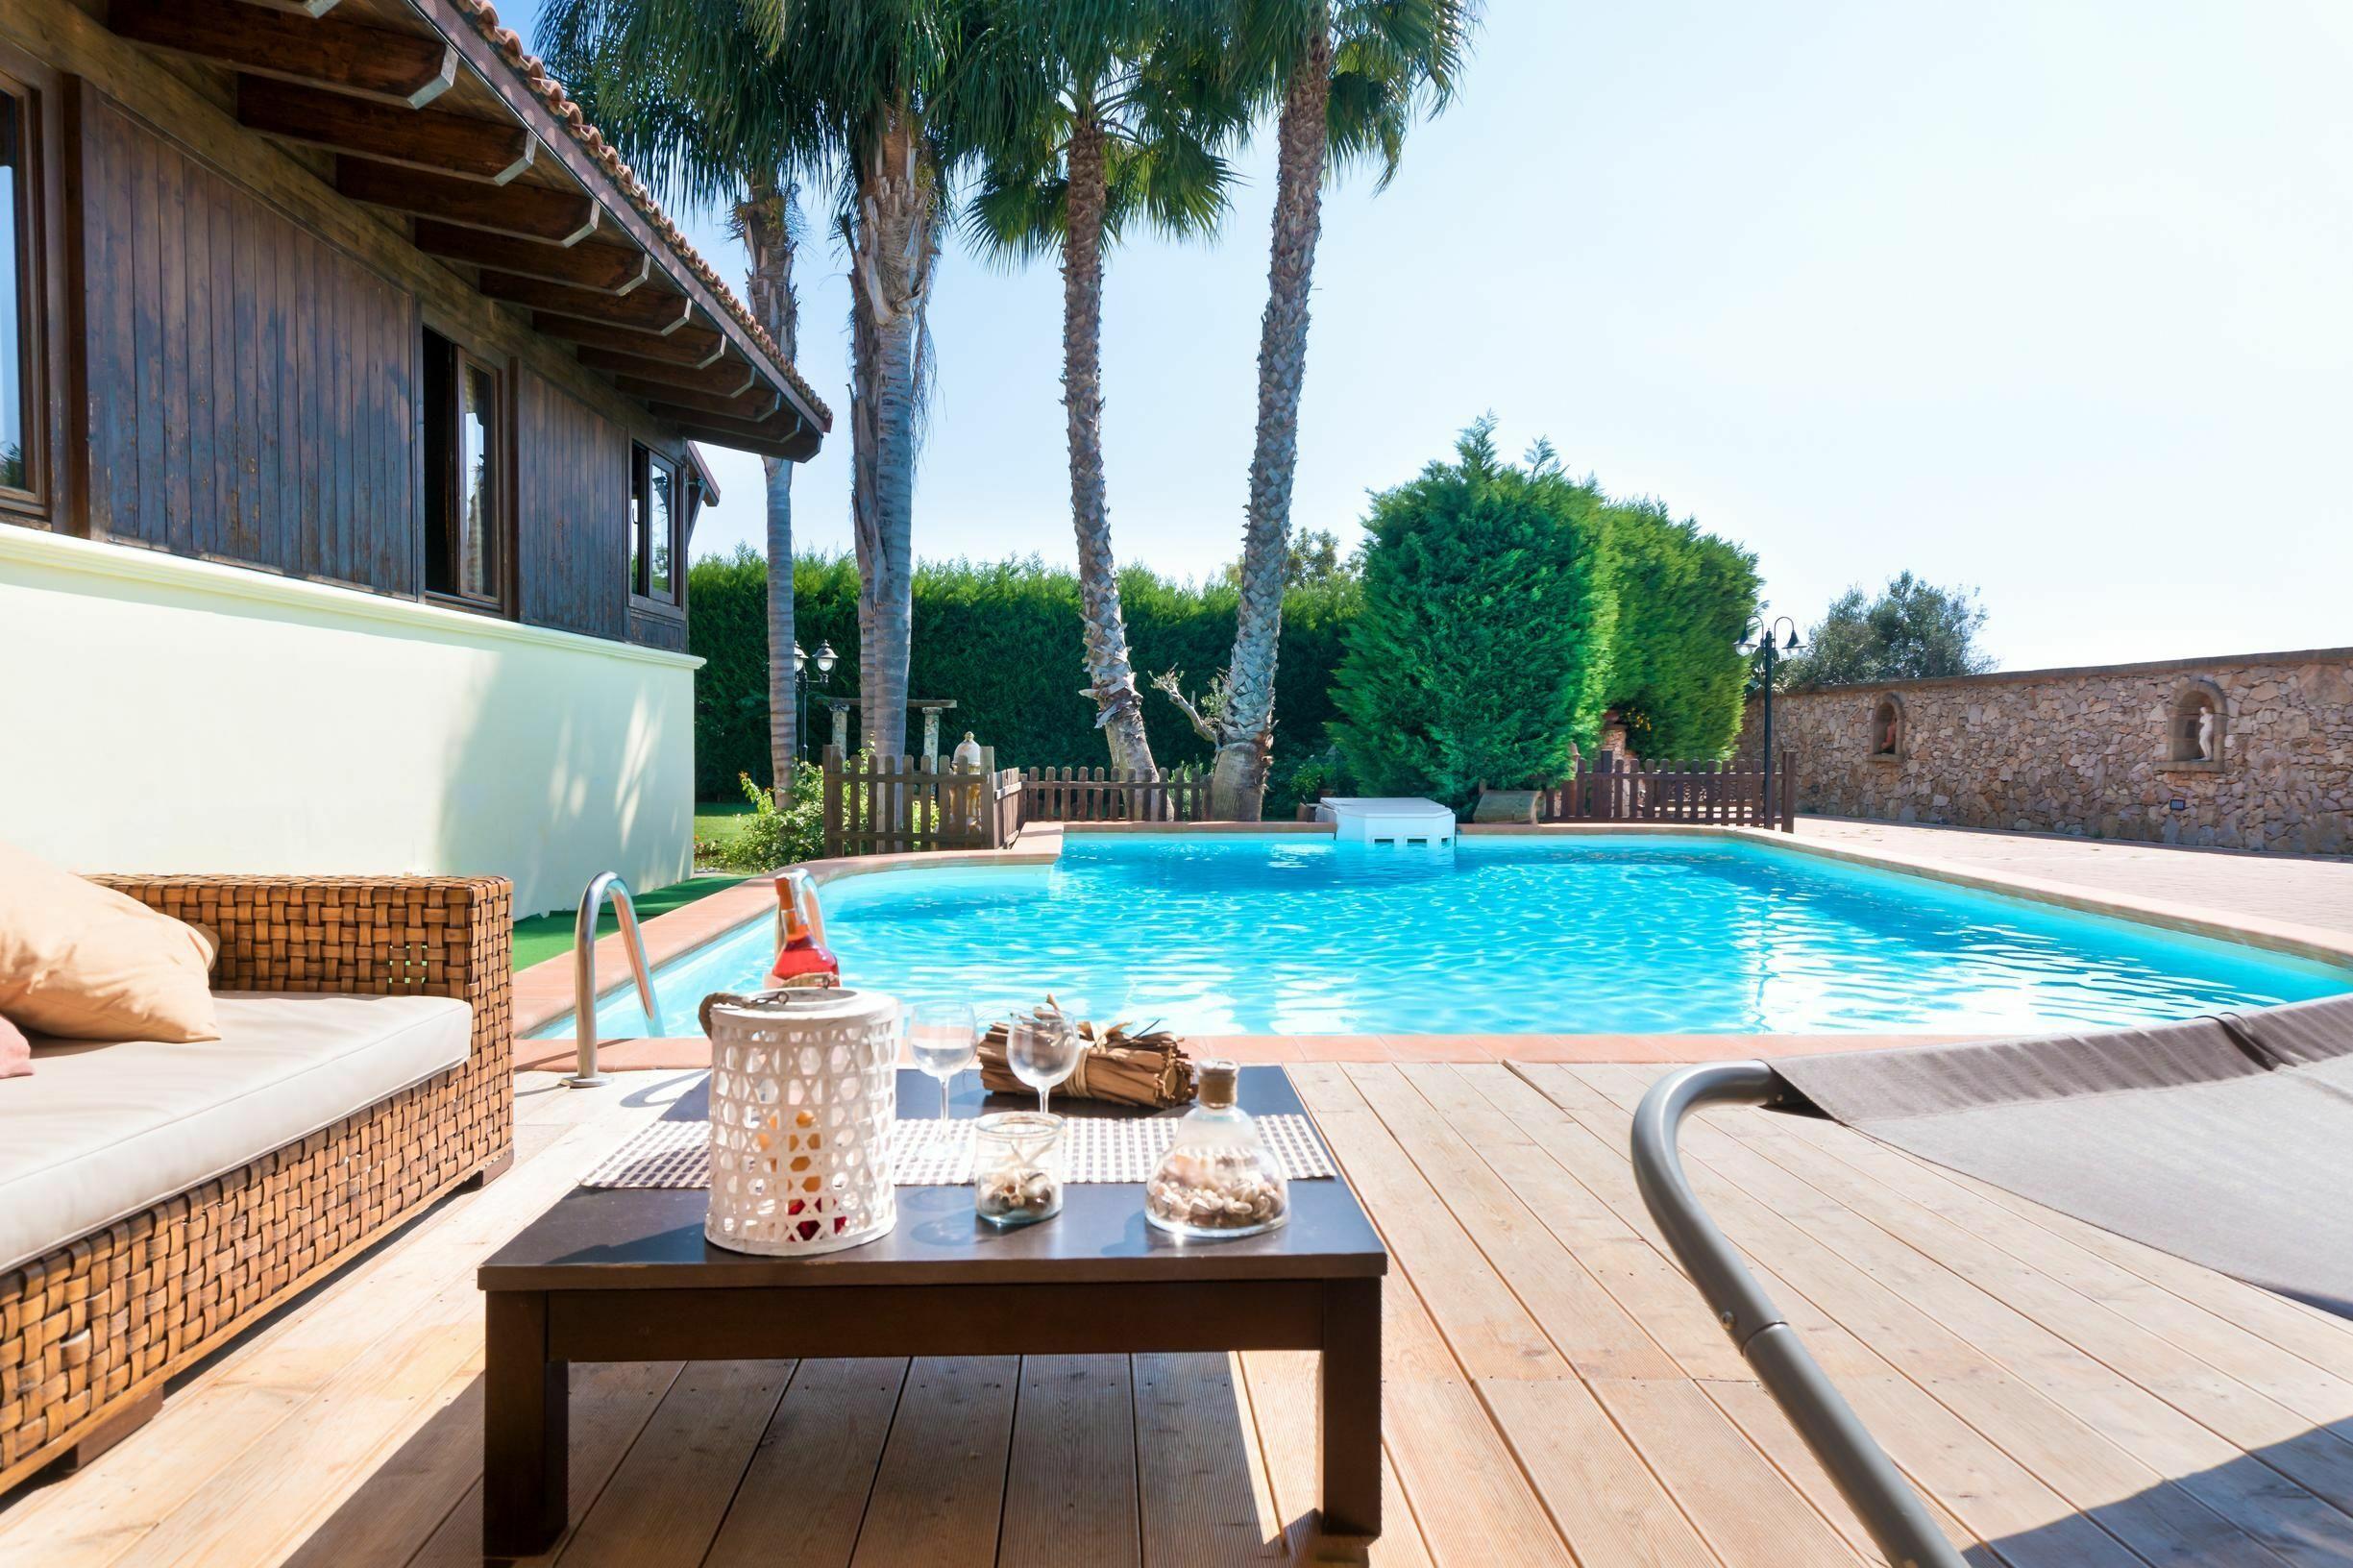 Luxury Pool Chalet Marina Di Mancaversa-giannelli